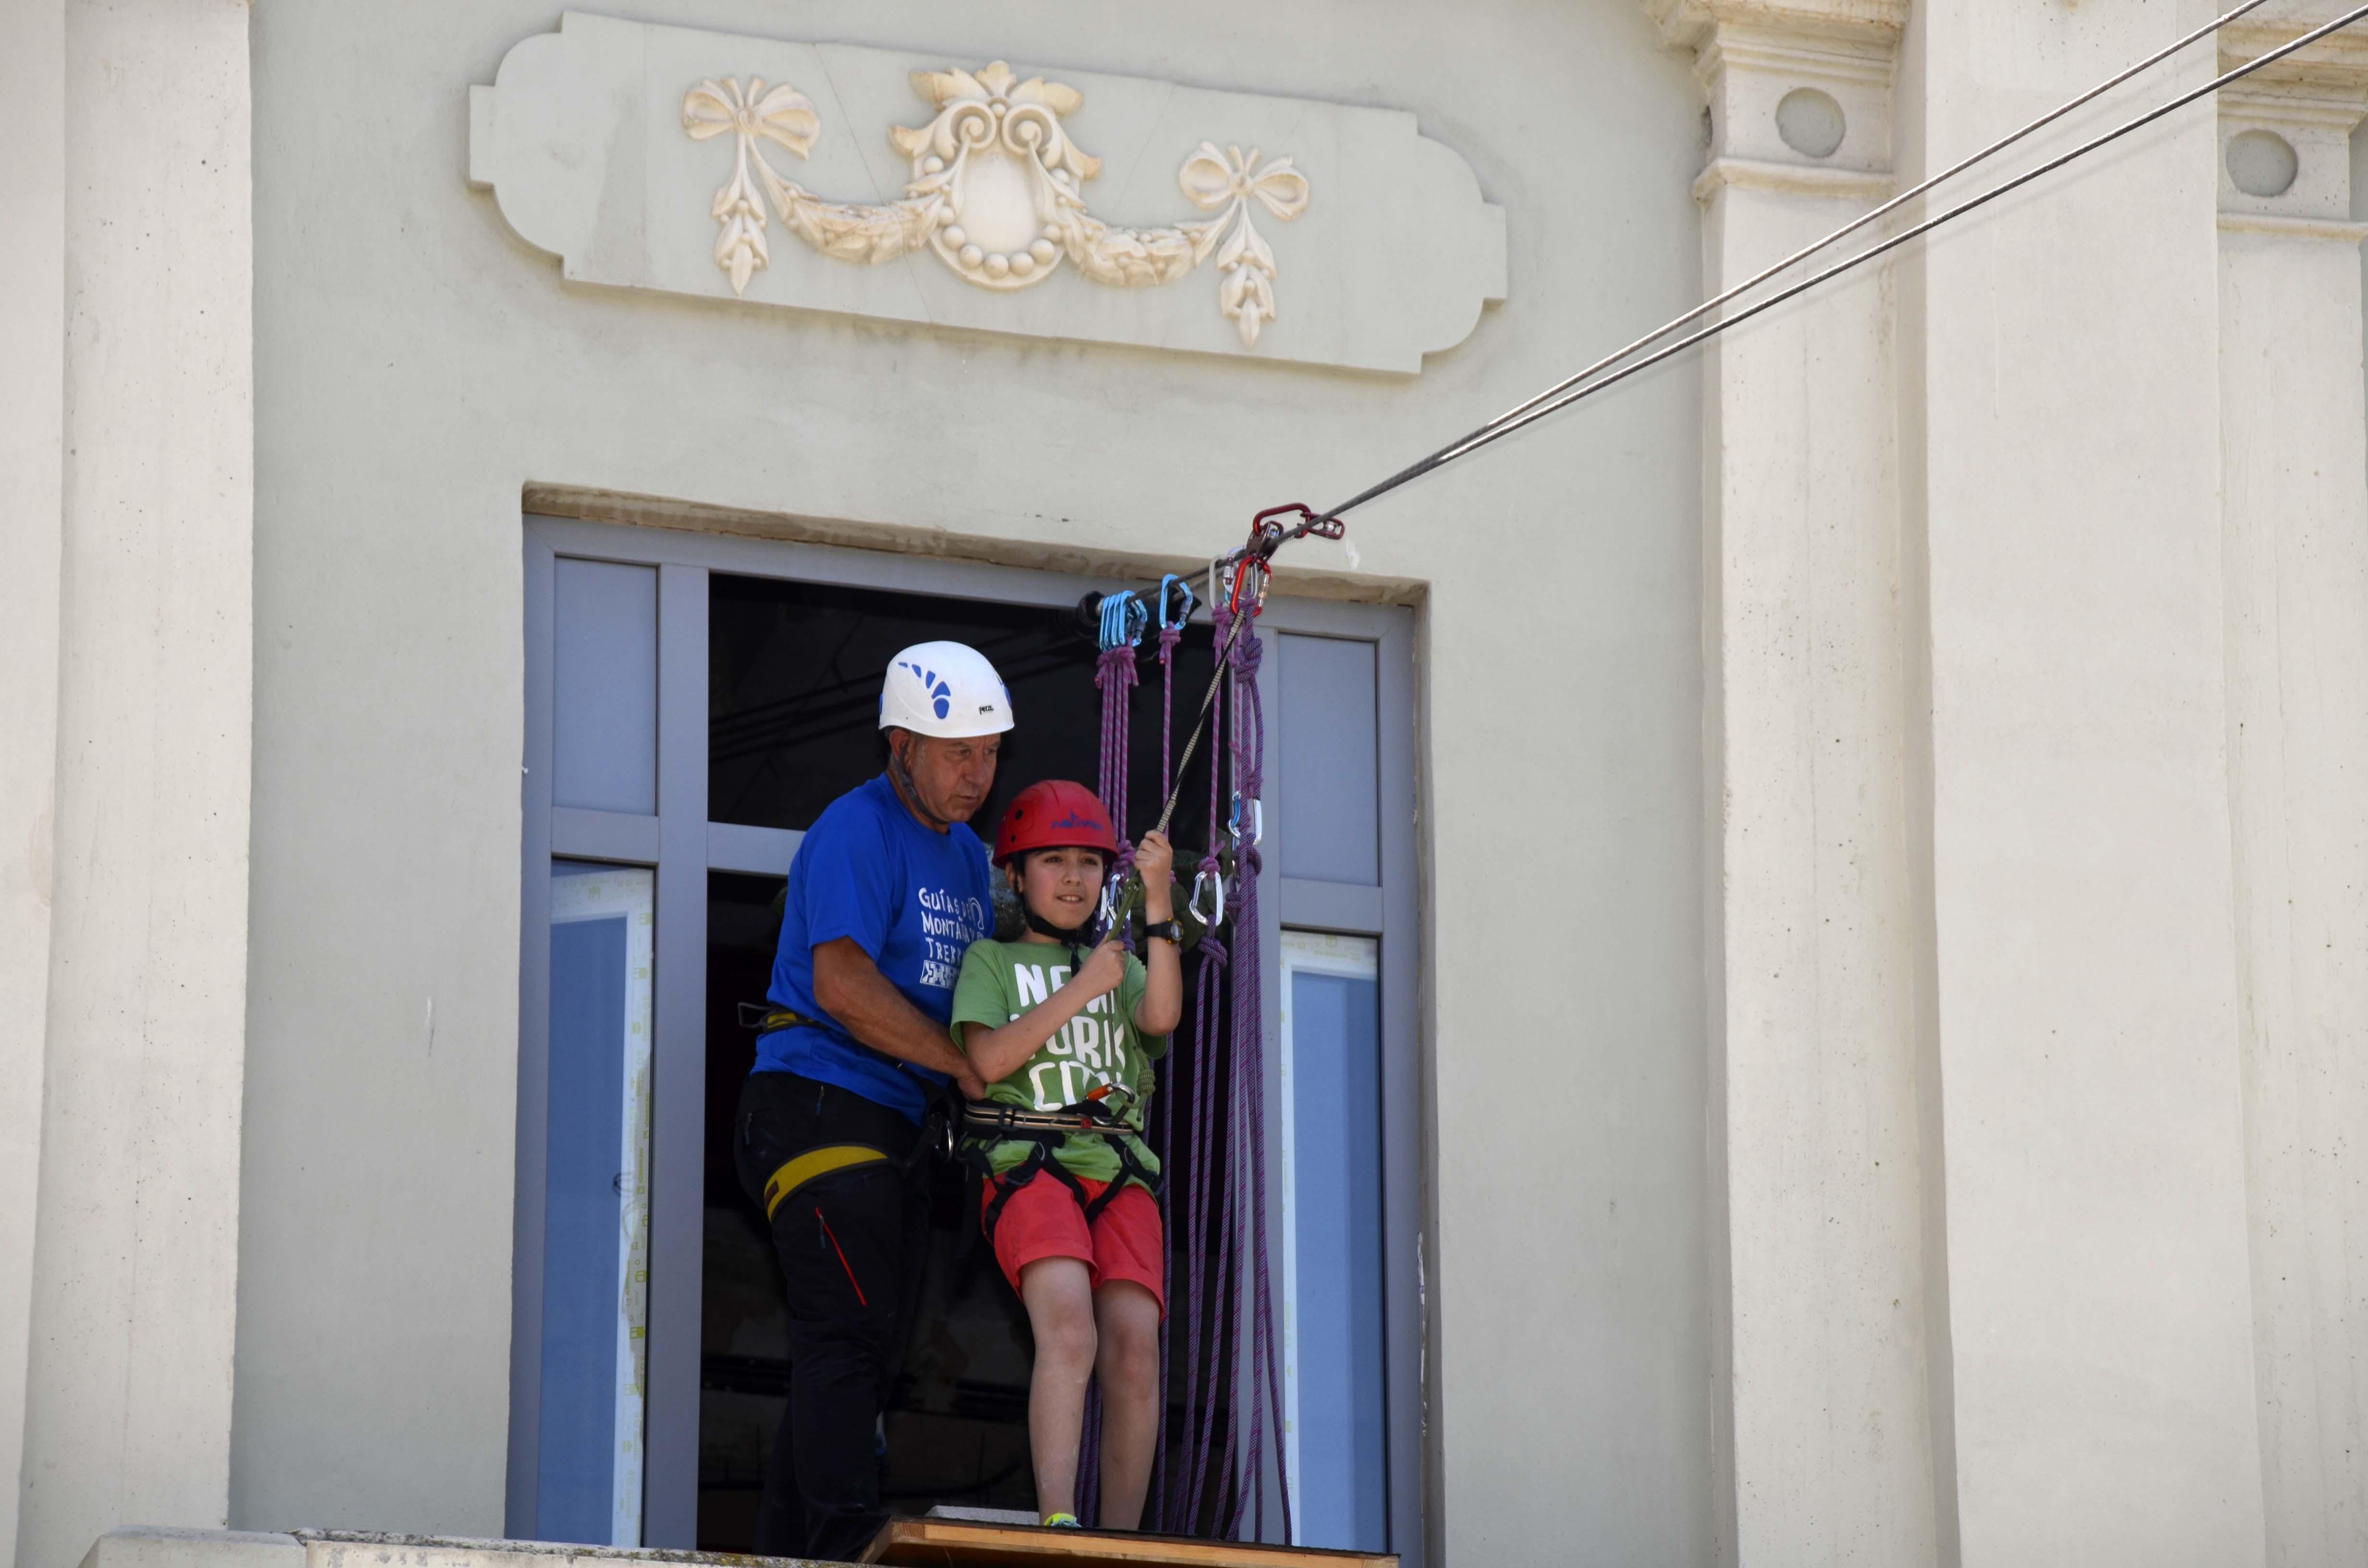 2015-05-31 DEPORTE EN LA CALLE PASEO (20)